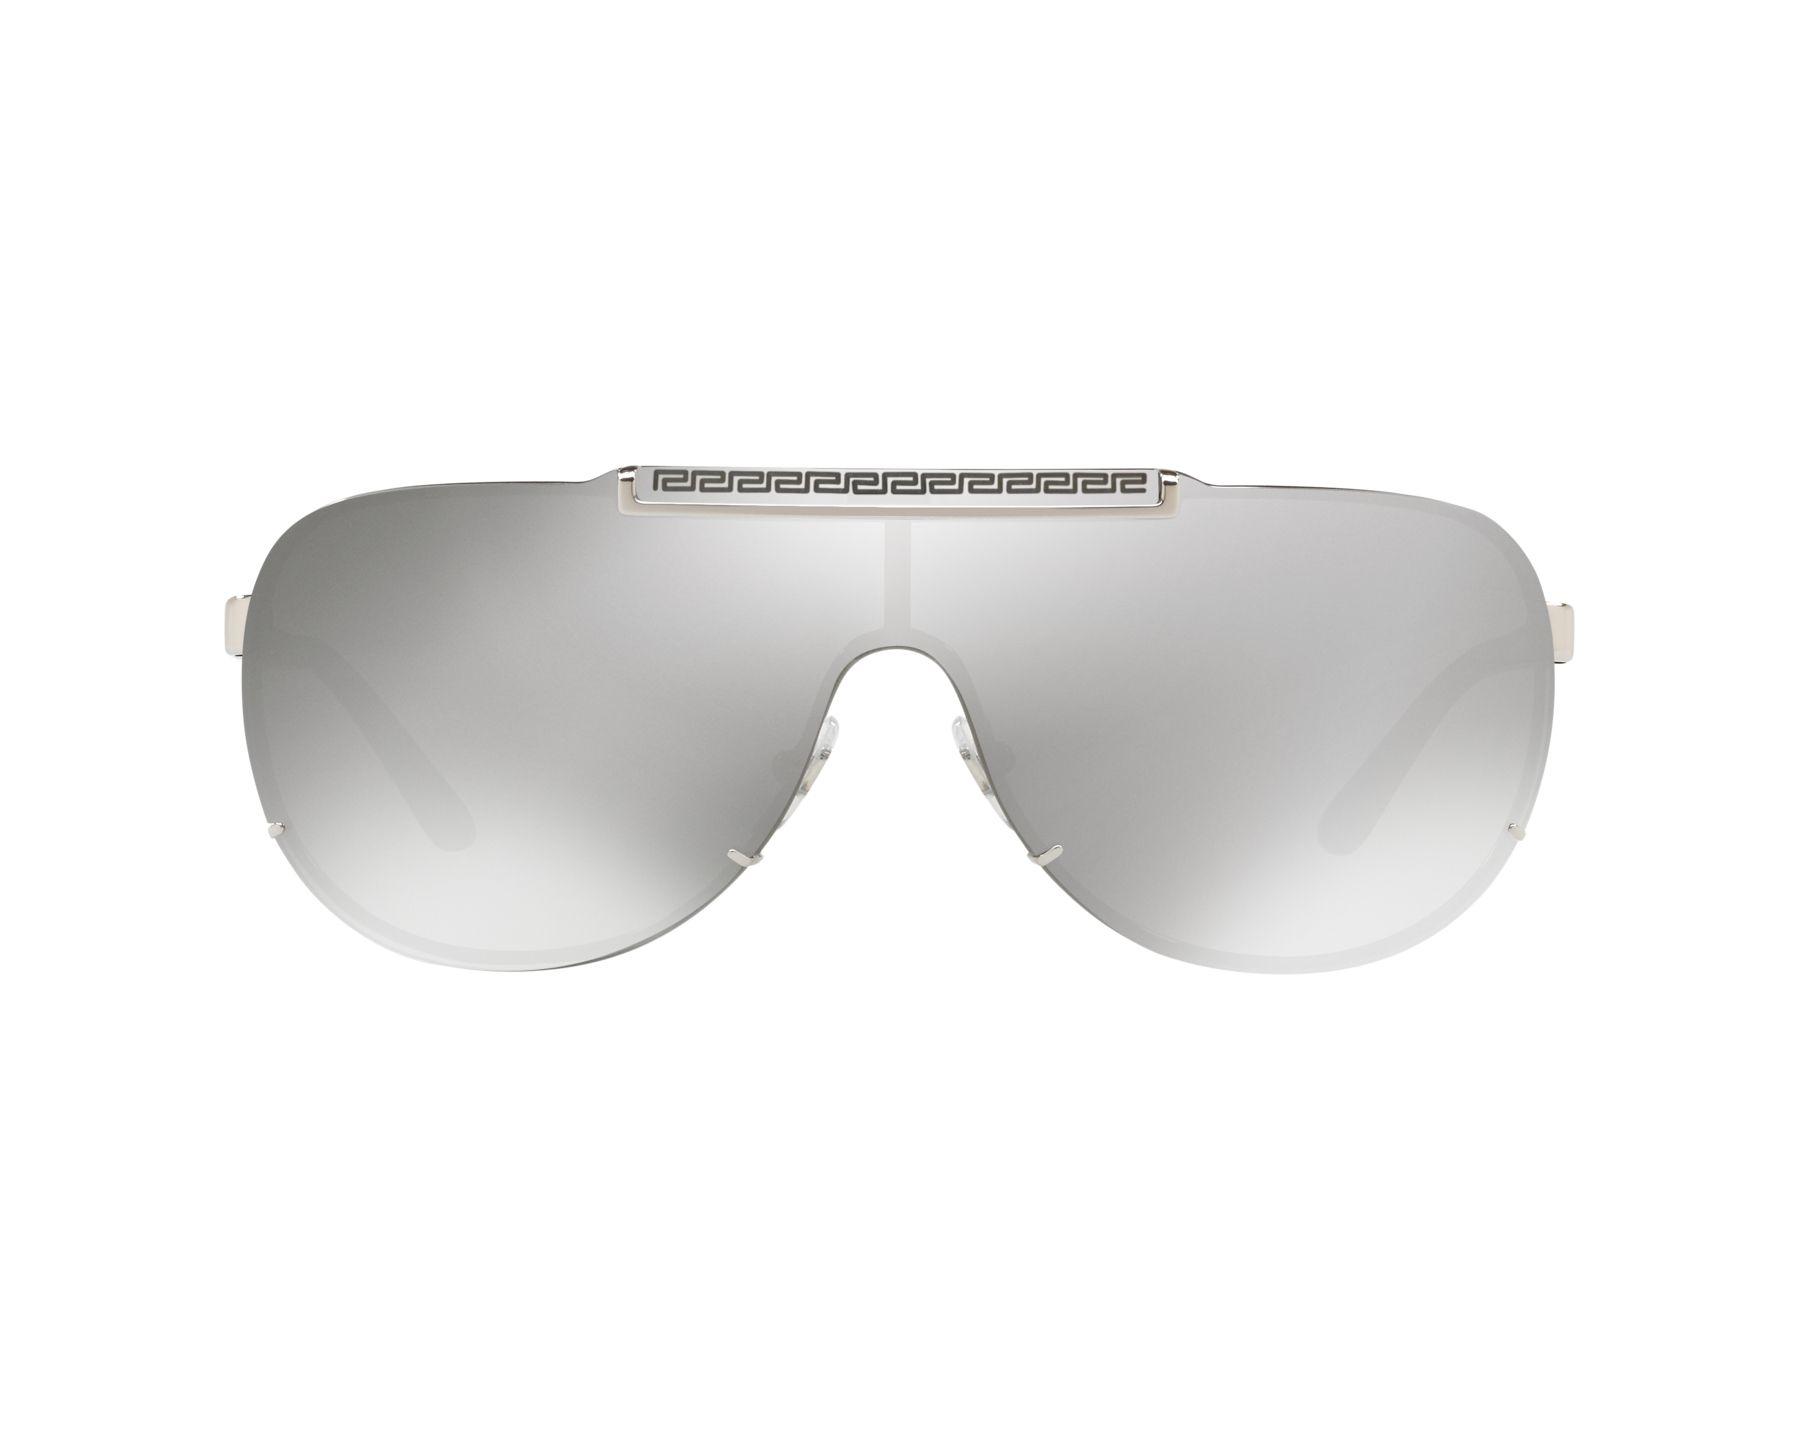 7ec93228098 Sunglasses Versace VE-2140 10006G 67-16 Silver Black 360 degree view 1